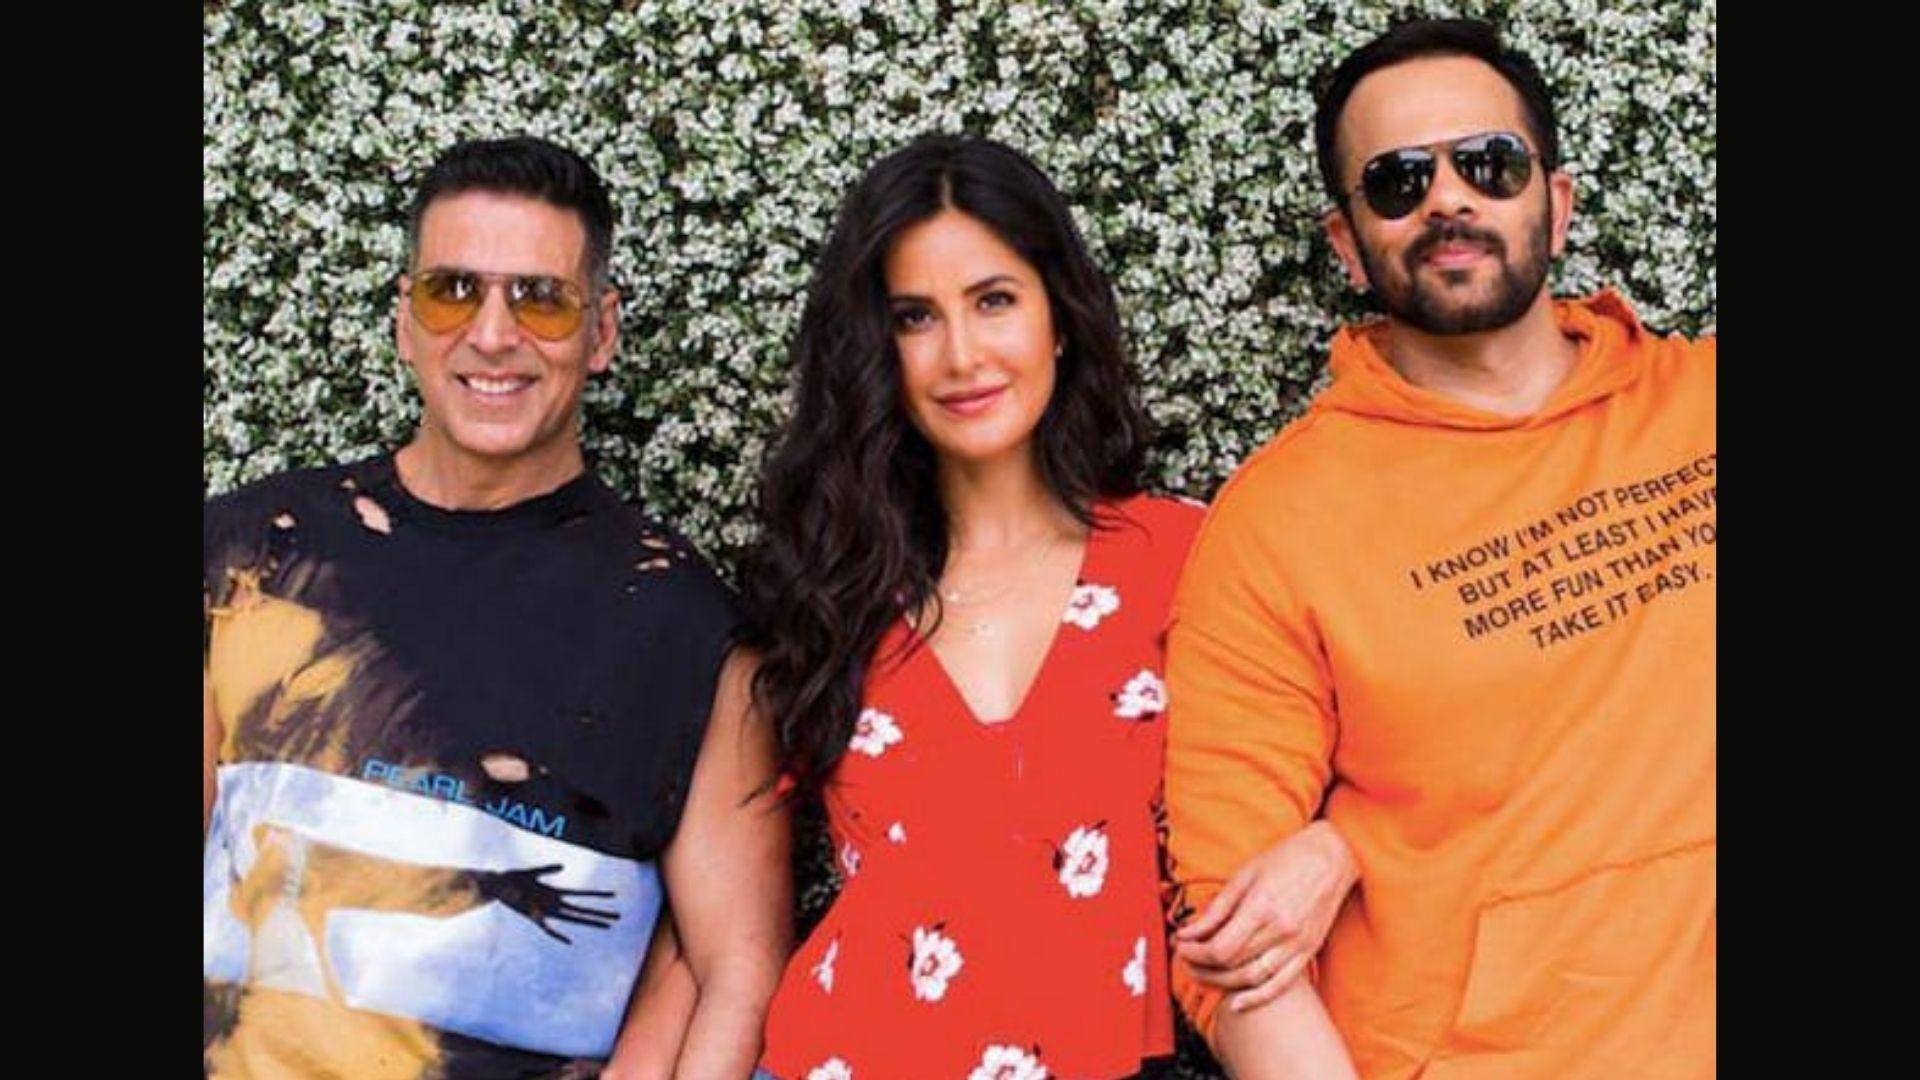 Sooryavanshi: Katrina Kaif Goofs Around With Akshay Kumar And Rohit Shetty During The Promotional Spree